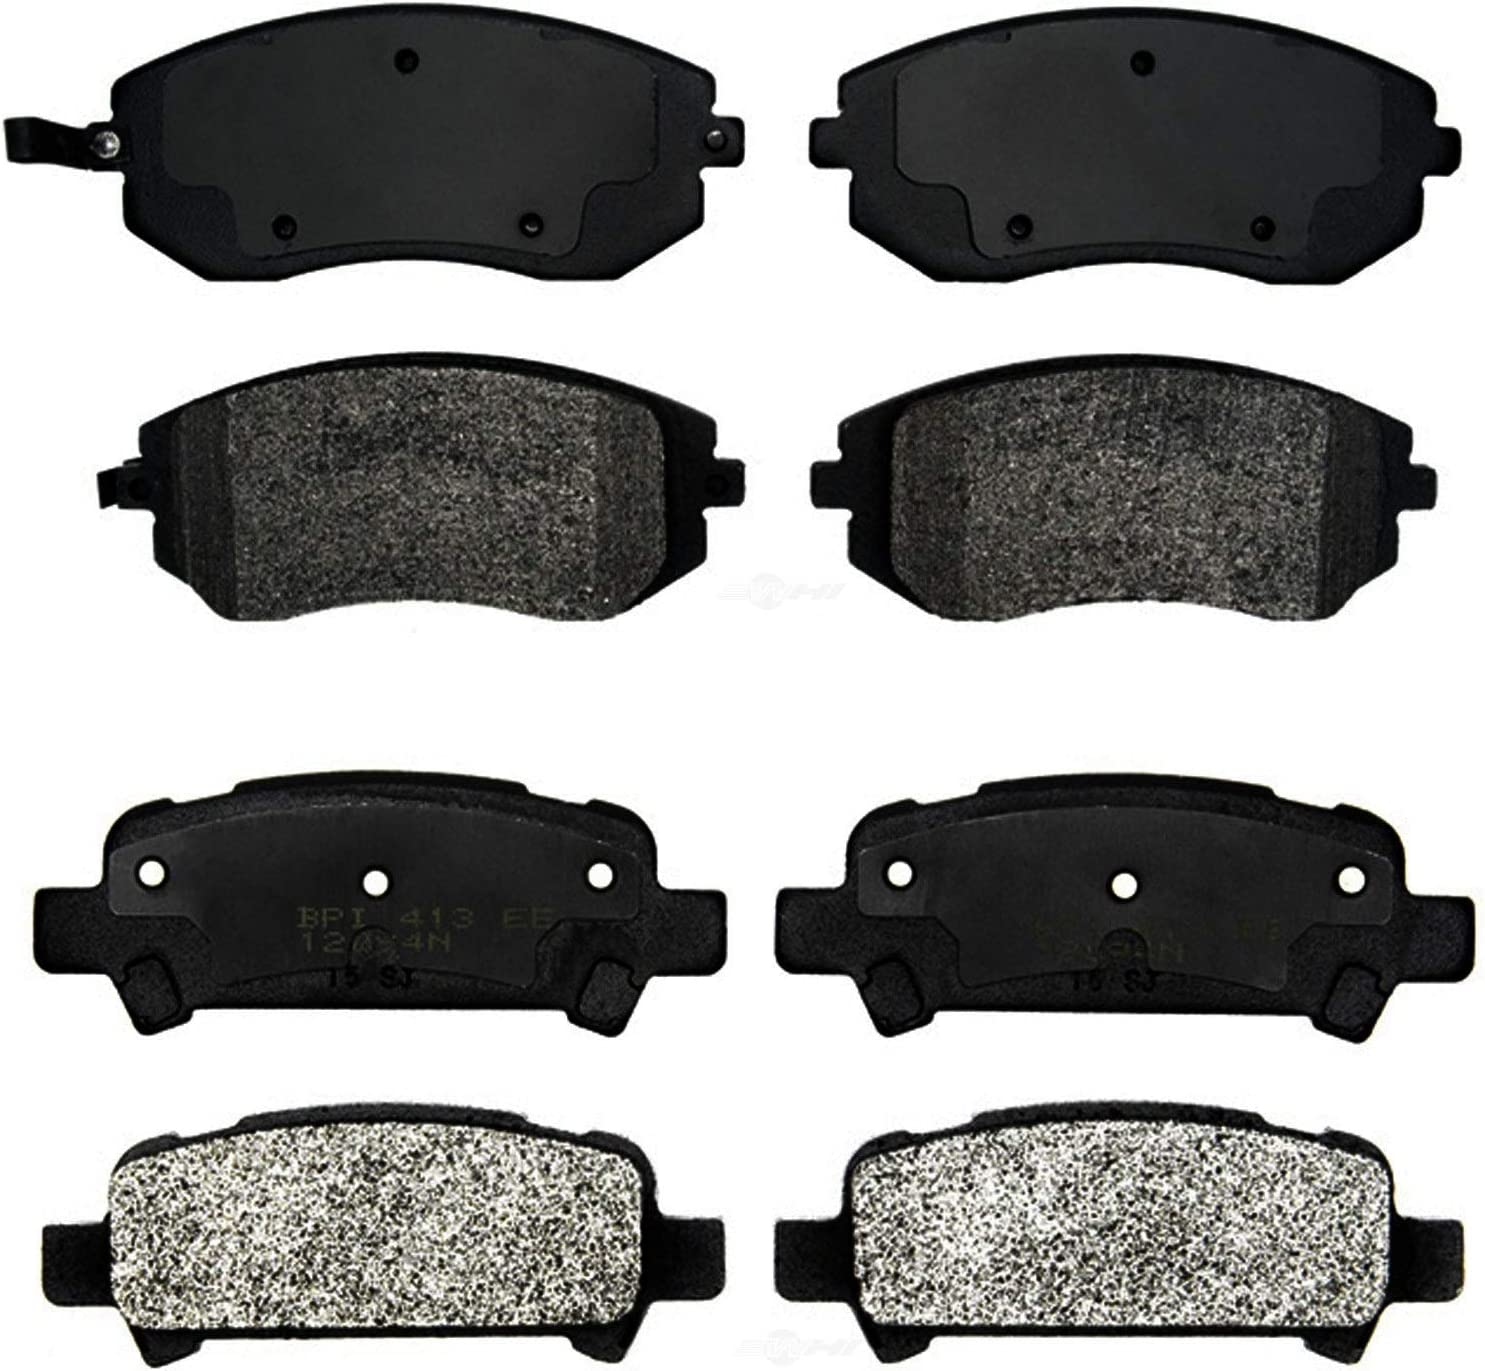 Front Rear Semi-Metallic Brake Reservation Pad Sets Kit Subaru Baja Credence PRO For